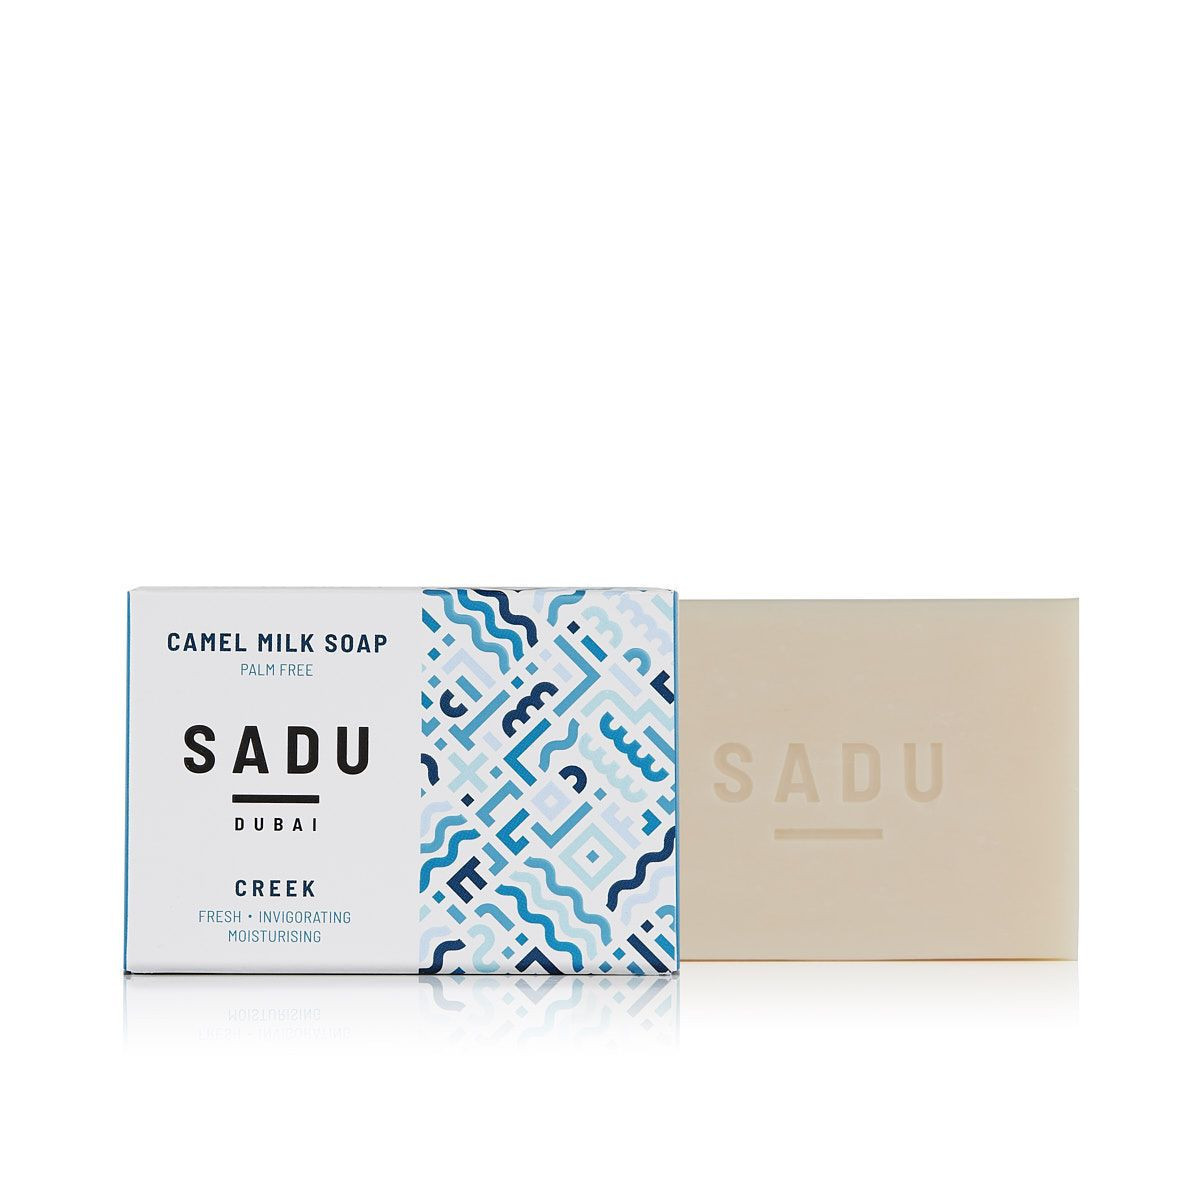 Camel milk soap Lime & Geranium - SADU collection